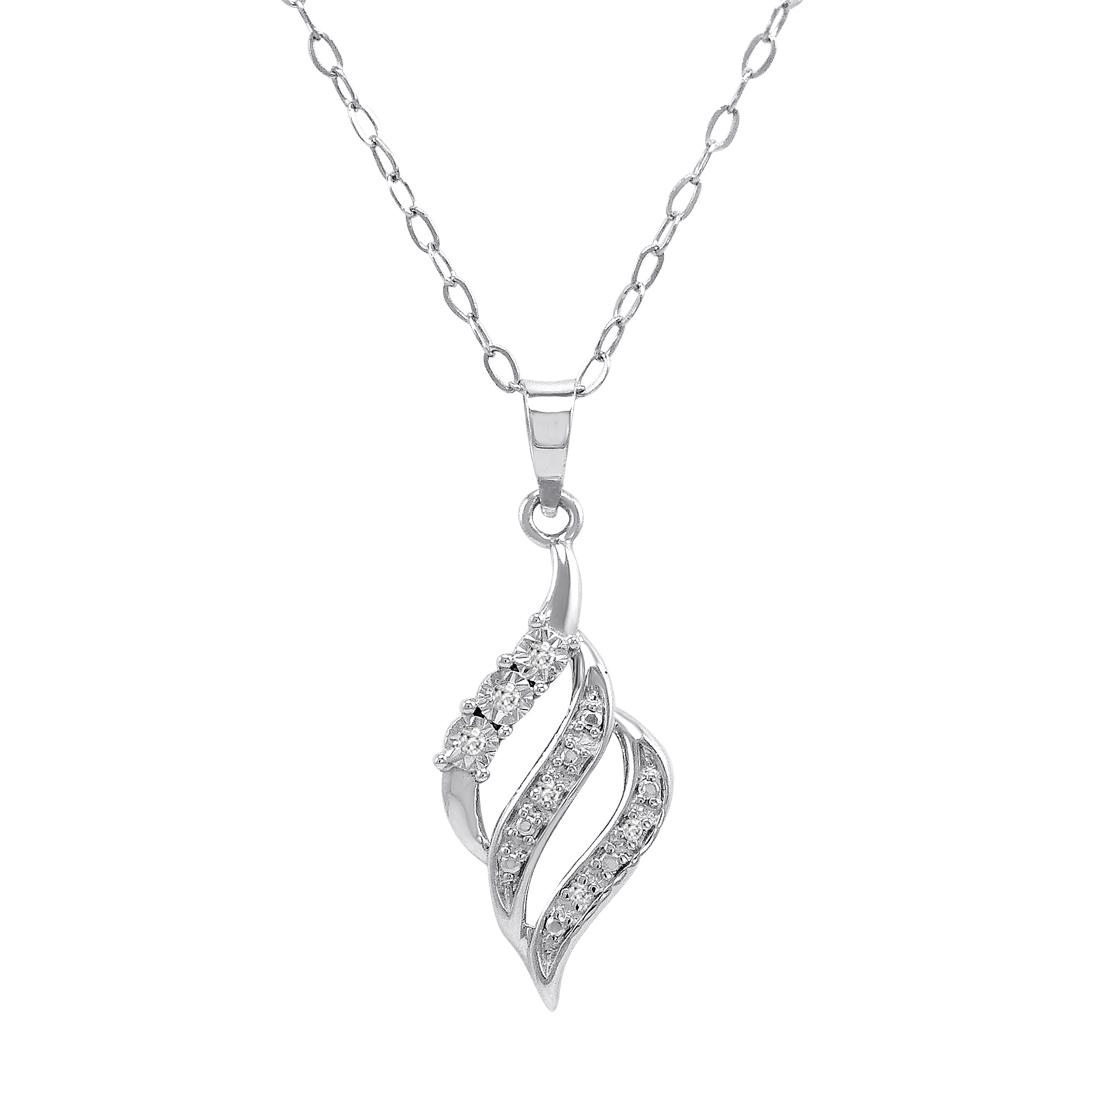 Diamond Swirl Pendant Necklace In 925 Sterling Silver